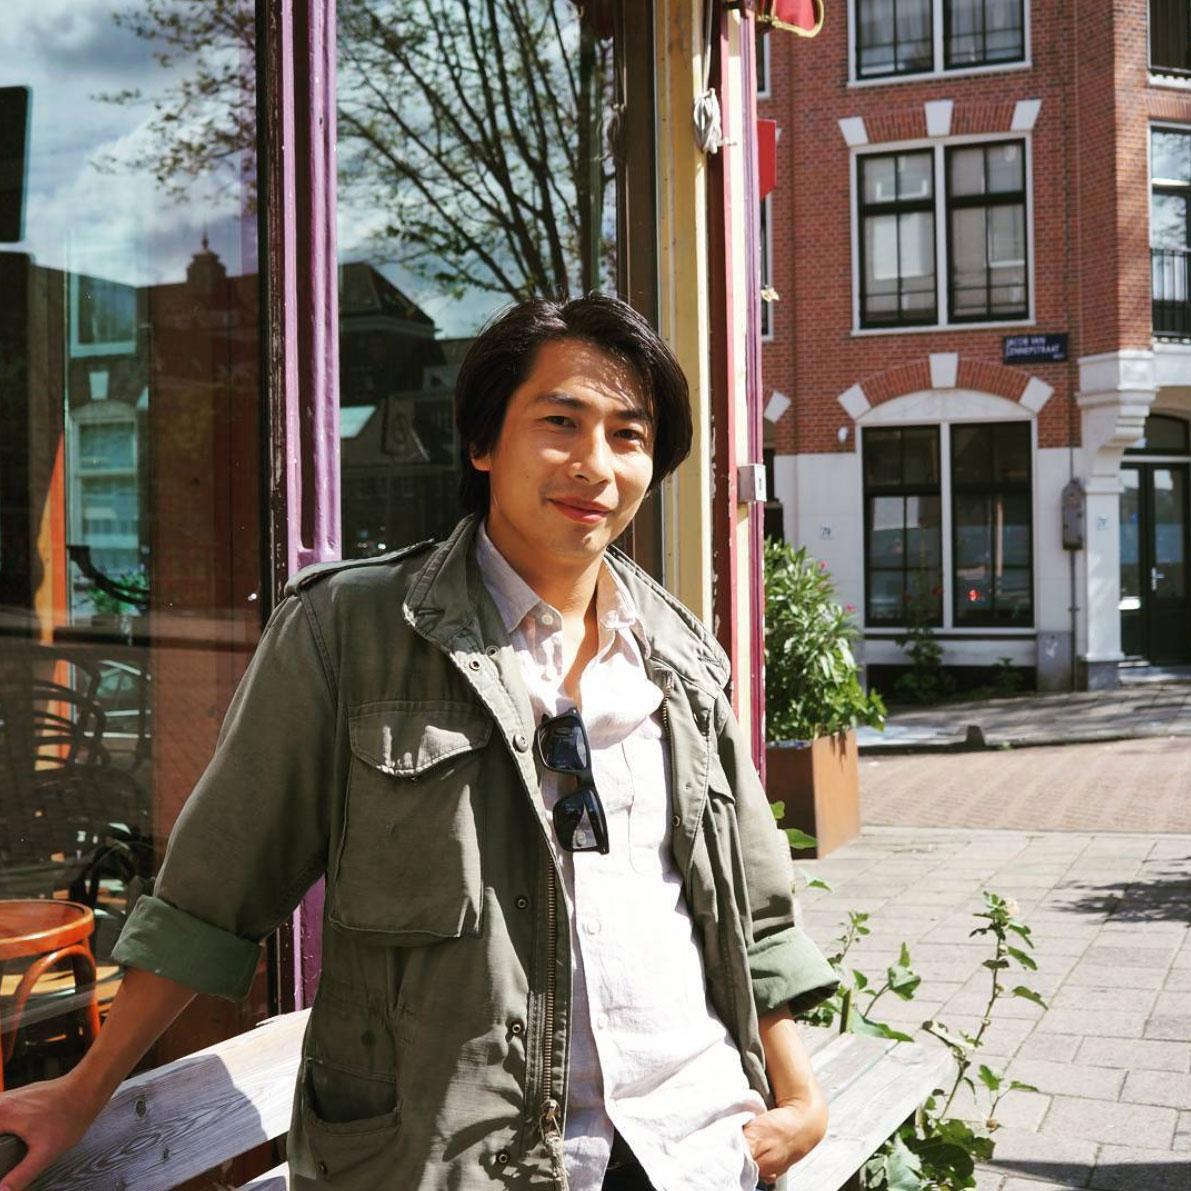 Baked-in-amsterdam-peter-1024px.jpg